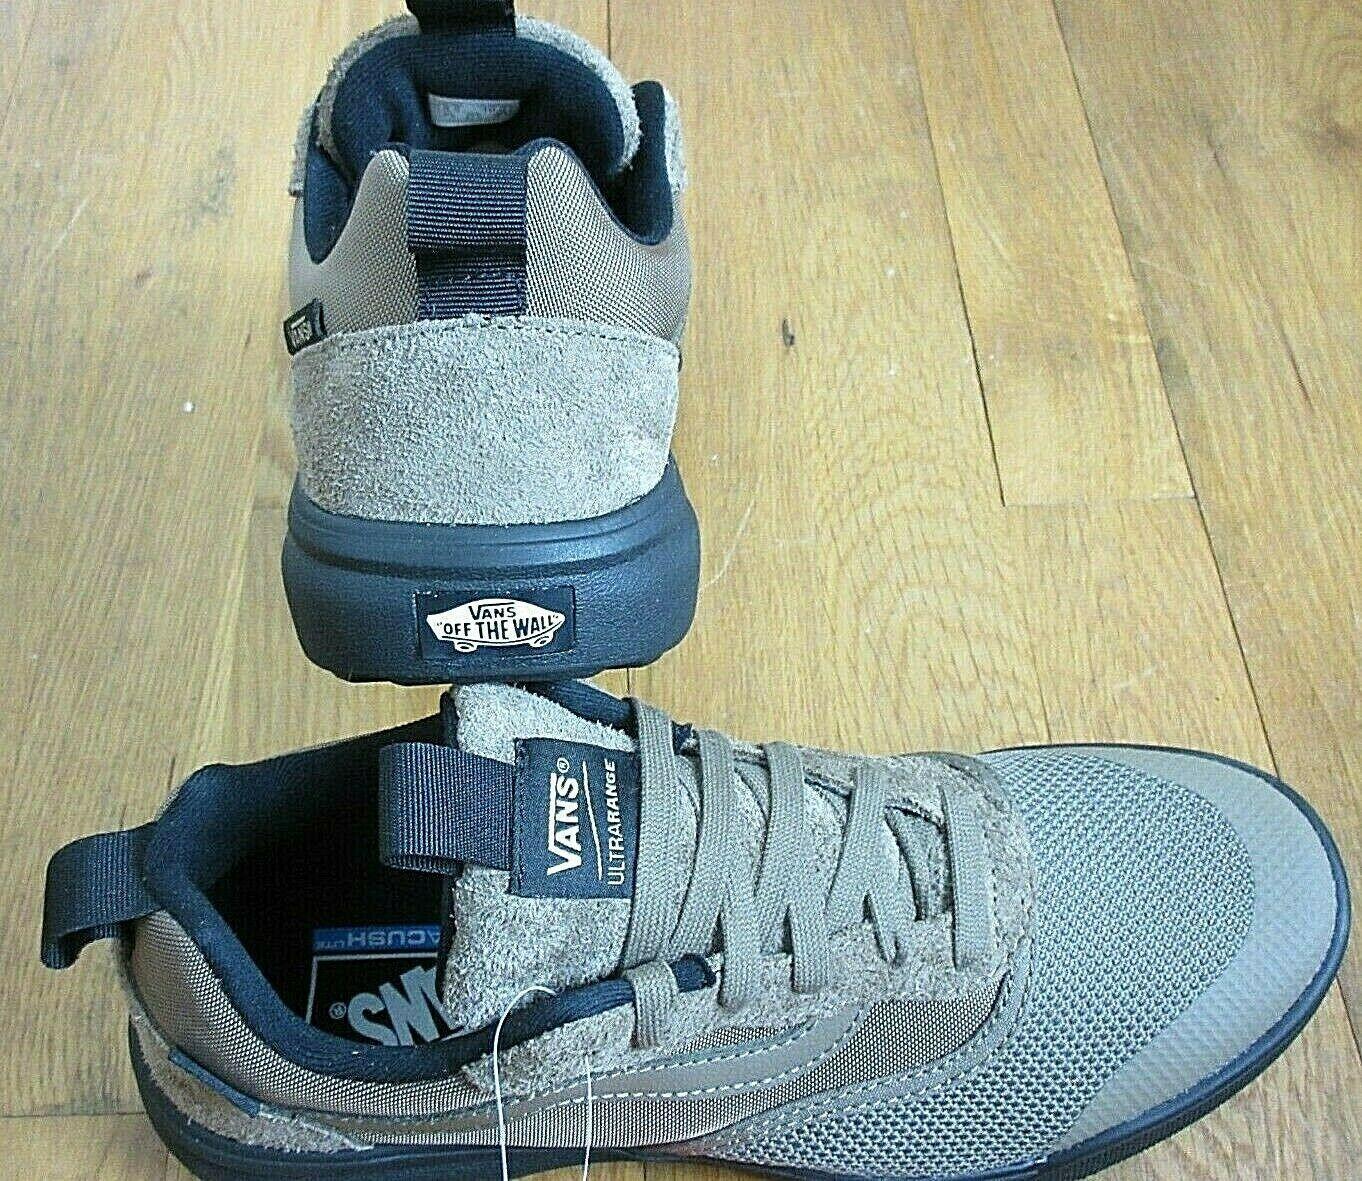 Vans Mens UltraRange Cub Brown Black Suede Mesh Skate Trail shoes Size 7.5 NWT